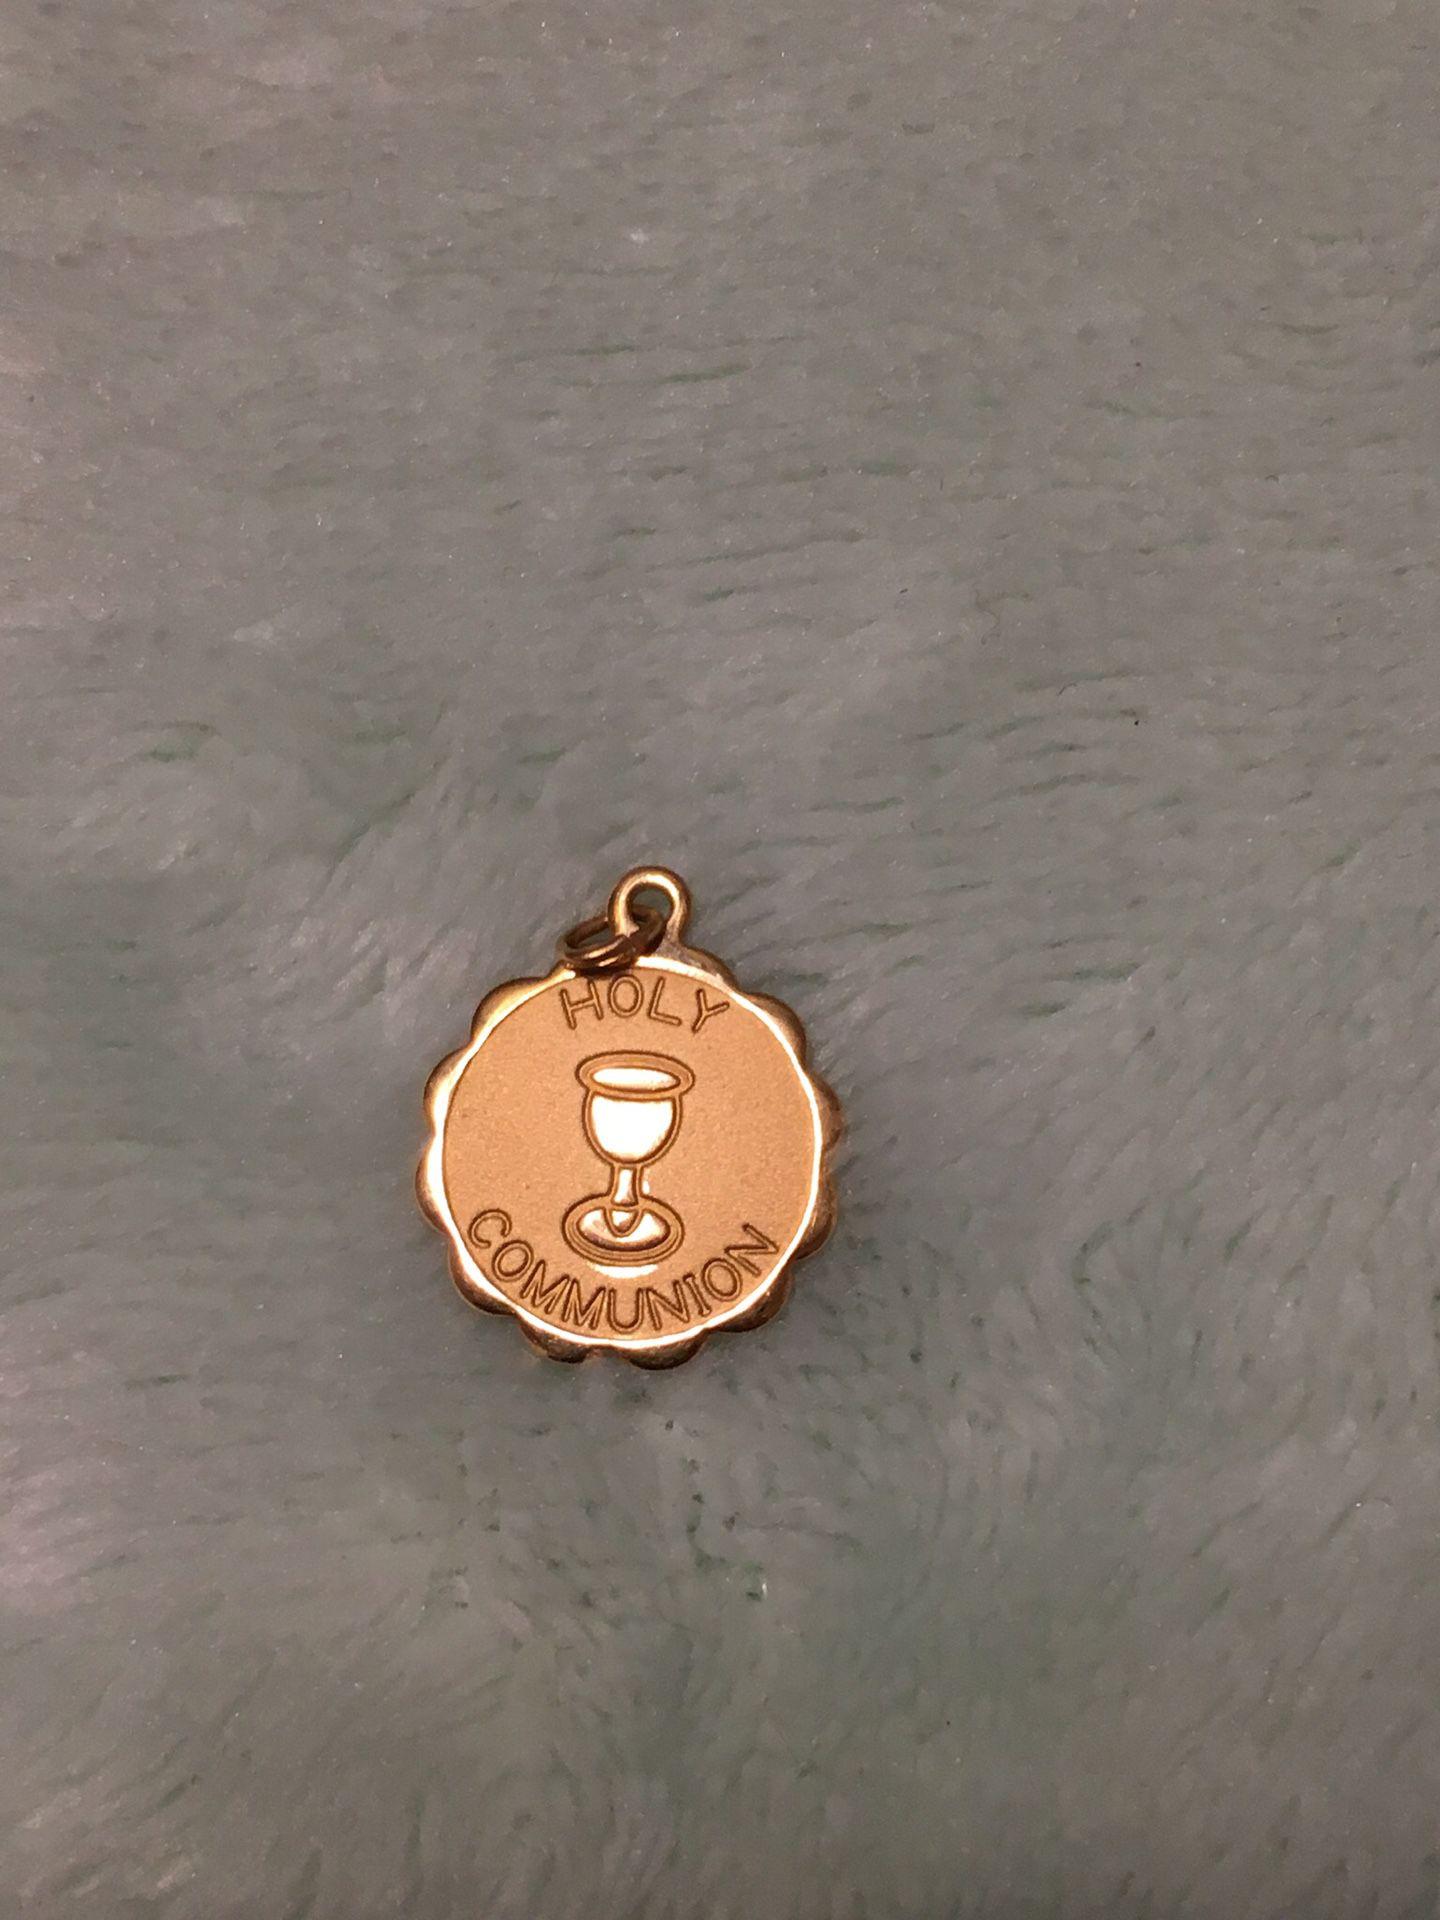 Antique 14k Gold holy communion Charm